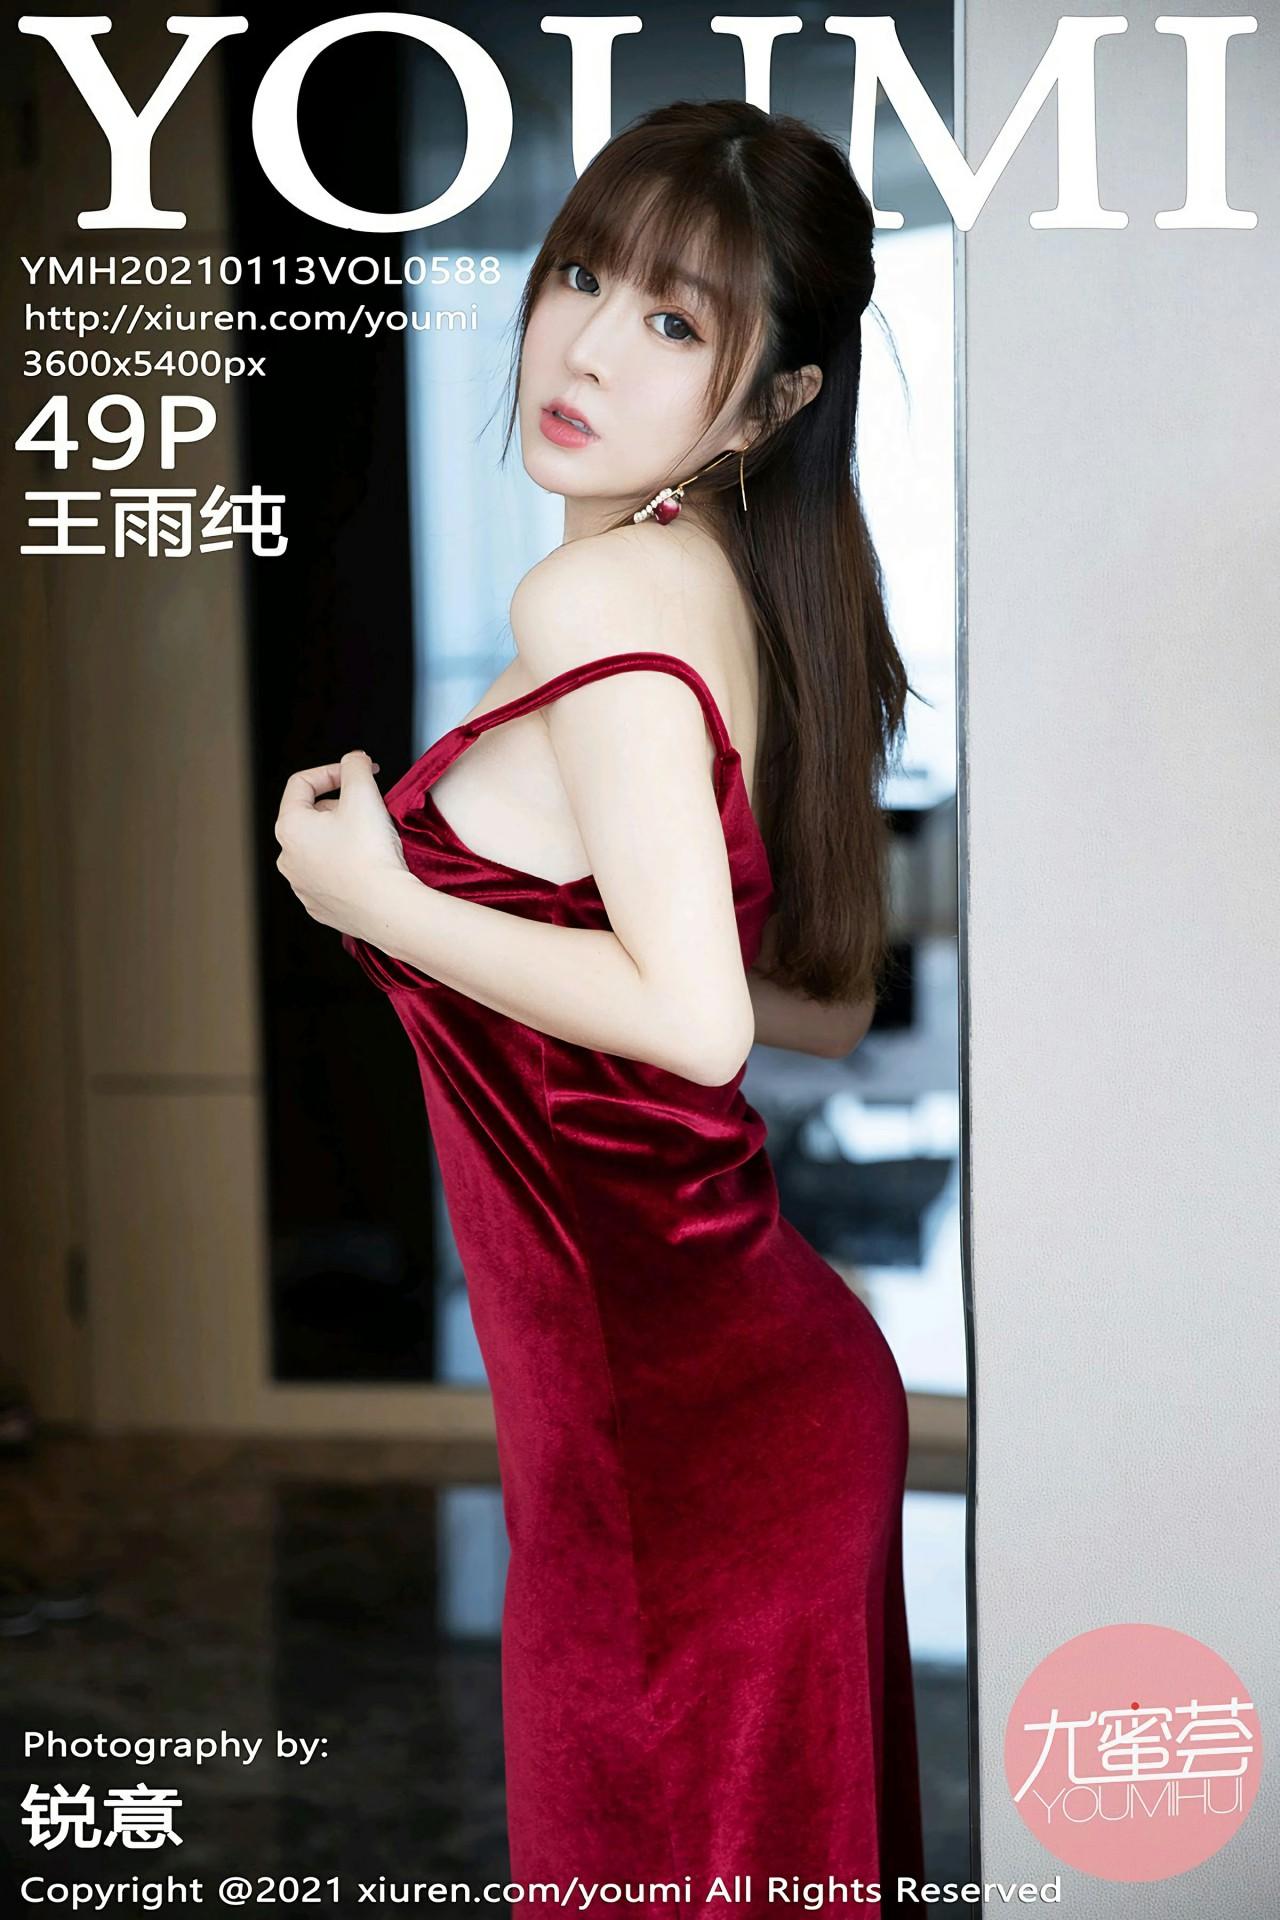 [YOUMI尤蜜荟] 2021.01.13 VOL.588 王雨纯